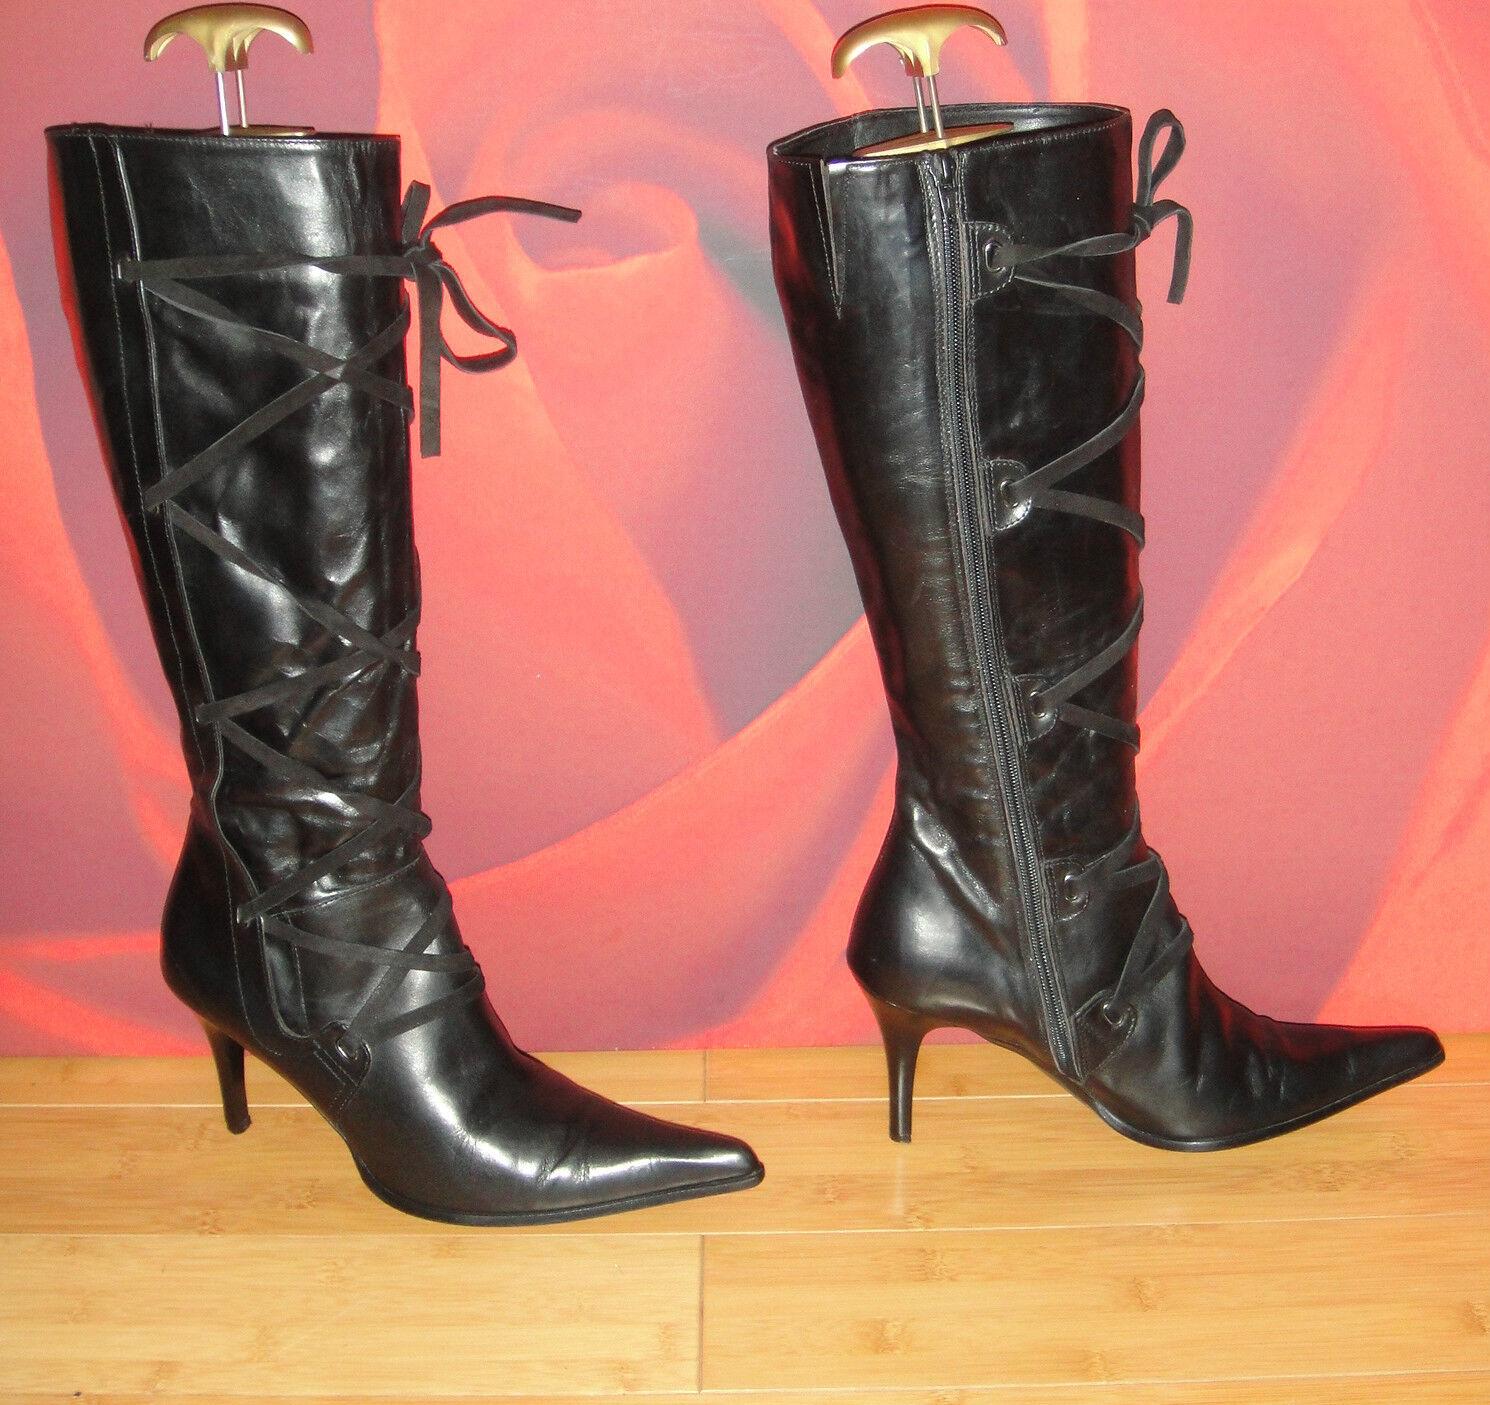 17 JR COLLECTION  Italian Black  leather  knee heel boots  EU 39